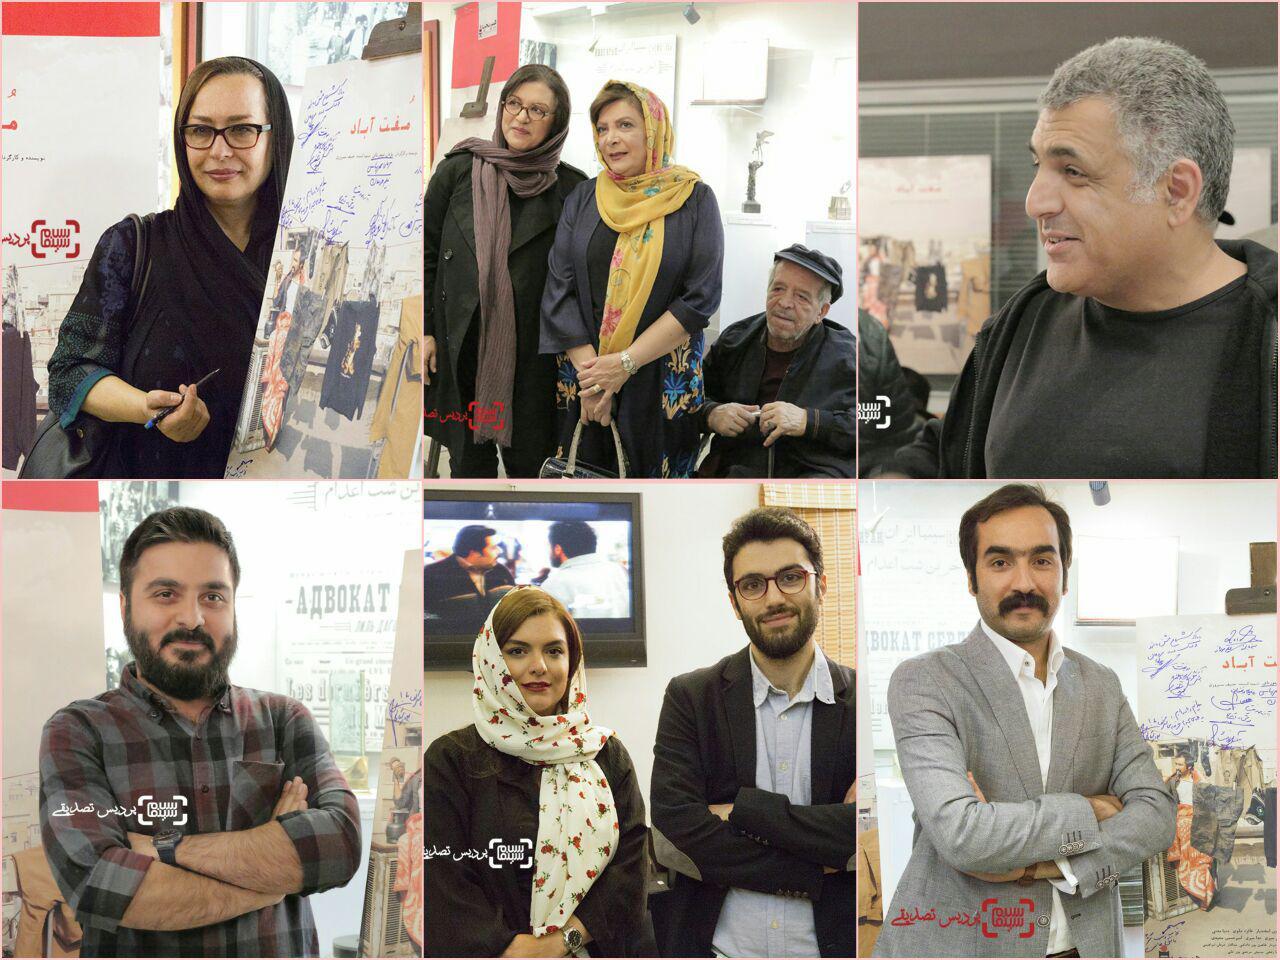 اکران خصوصی فیلم «مفت آباد»/ گزارش تصویری